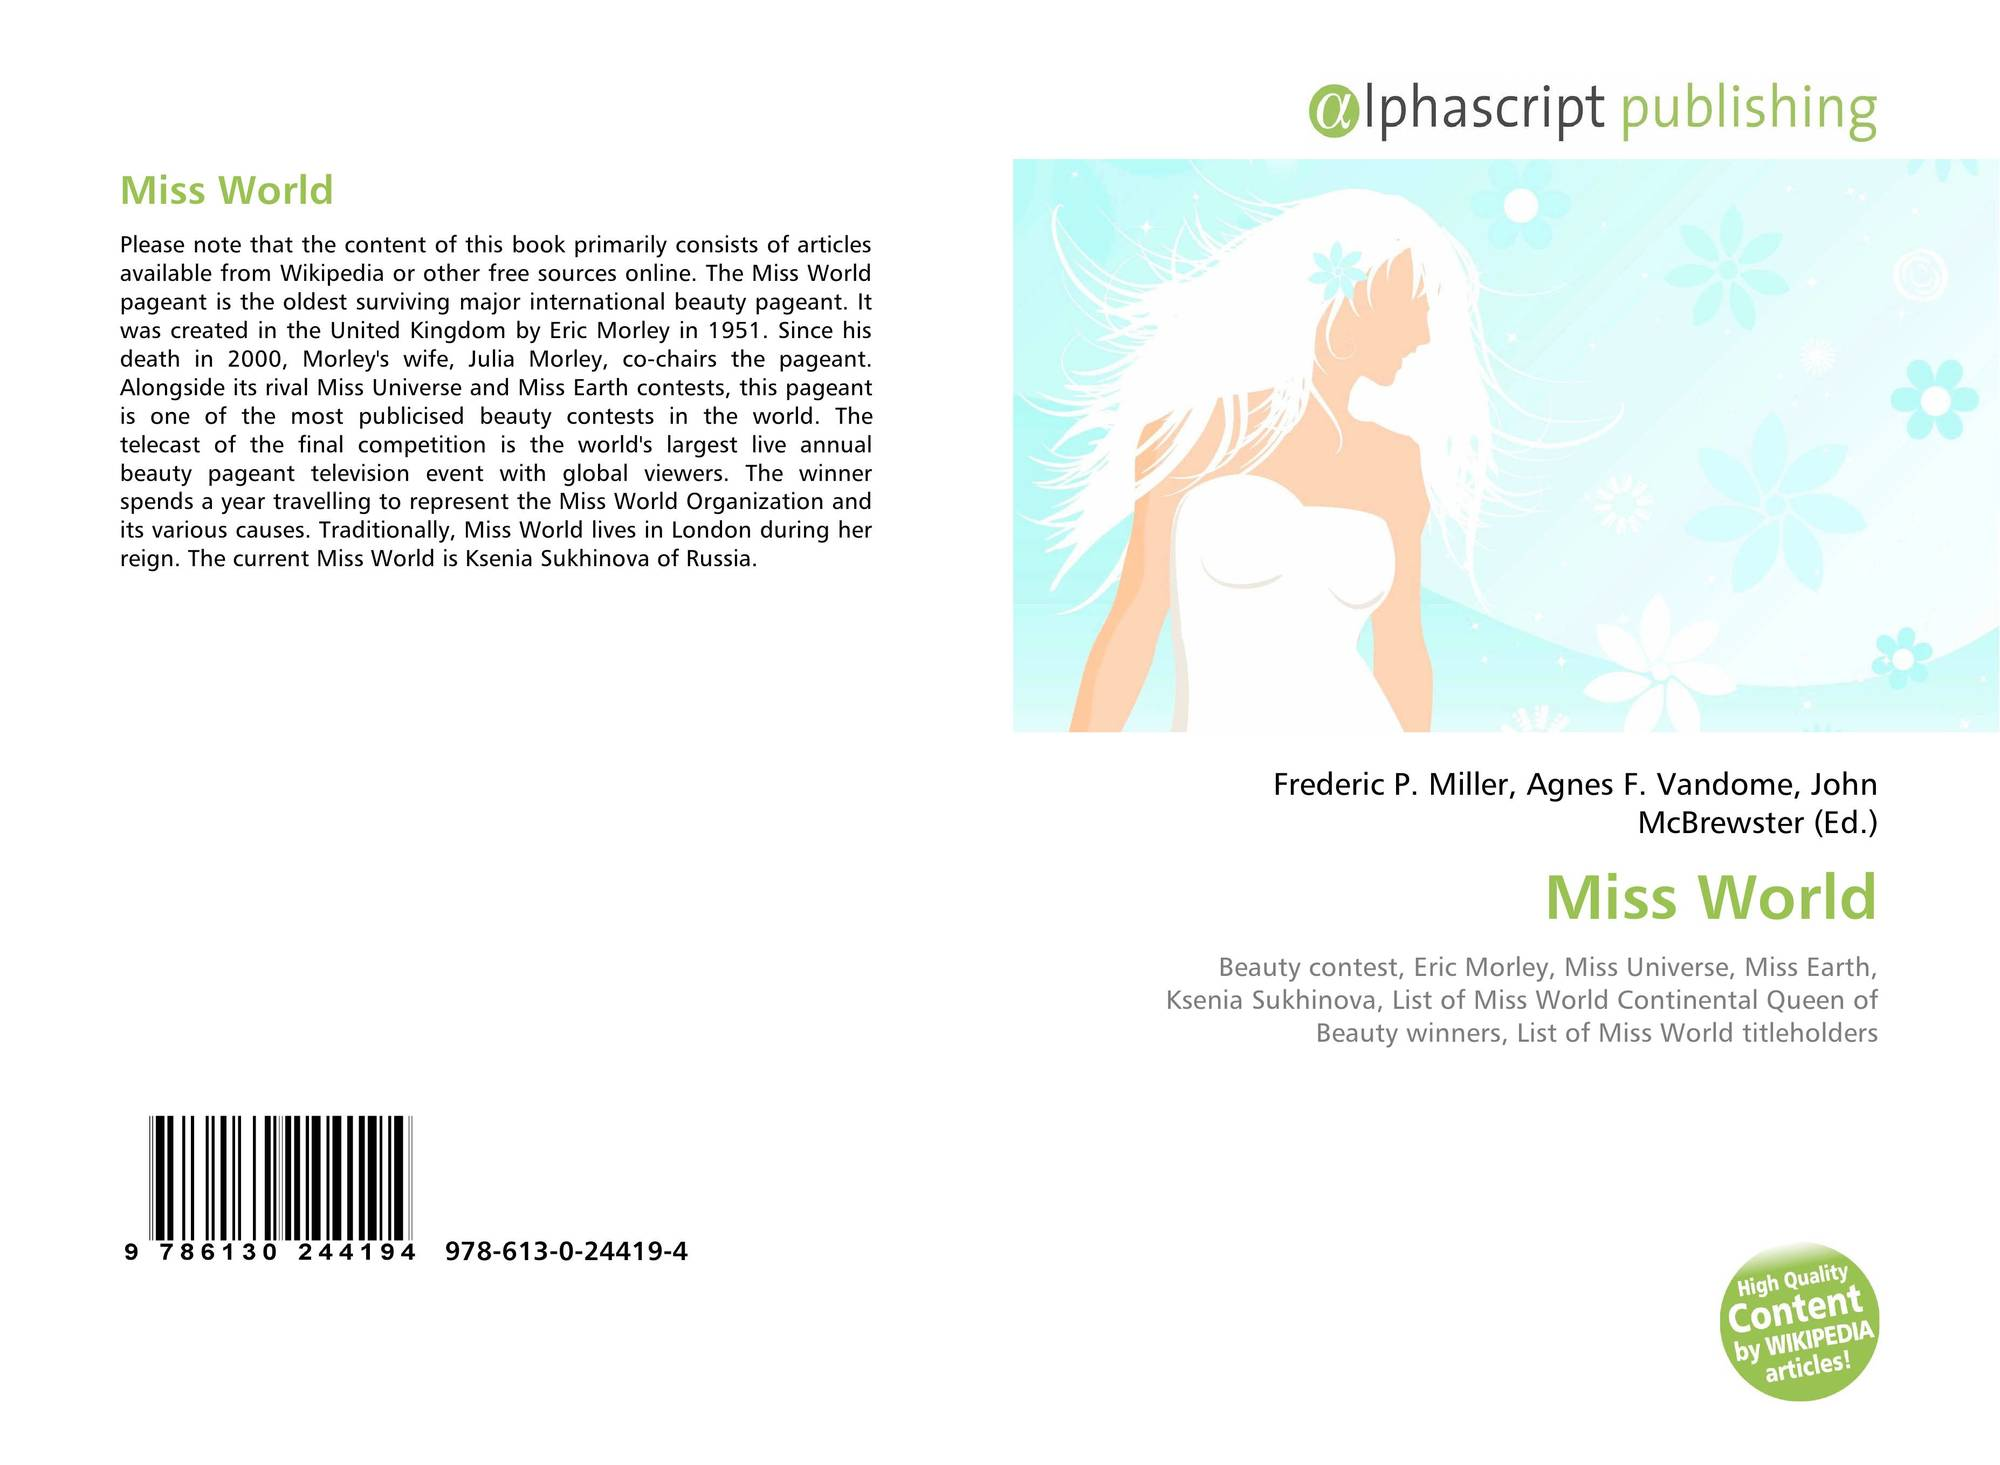 Miss World, 978-613-0-24419-4, 6130244193 ,9786130244194